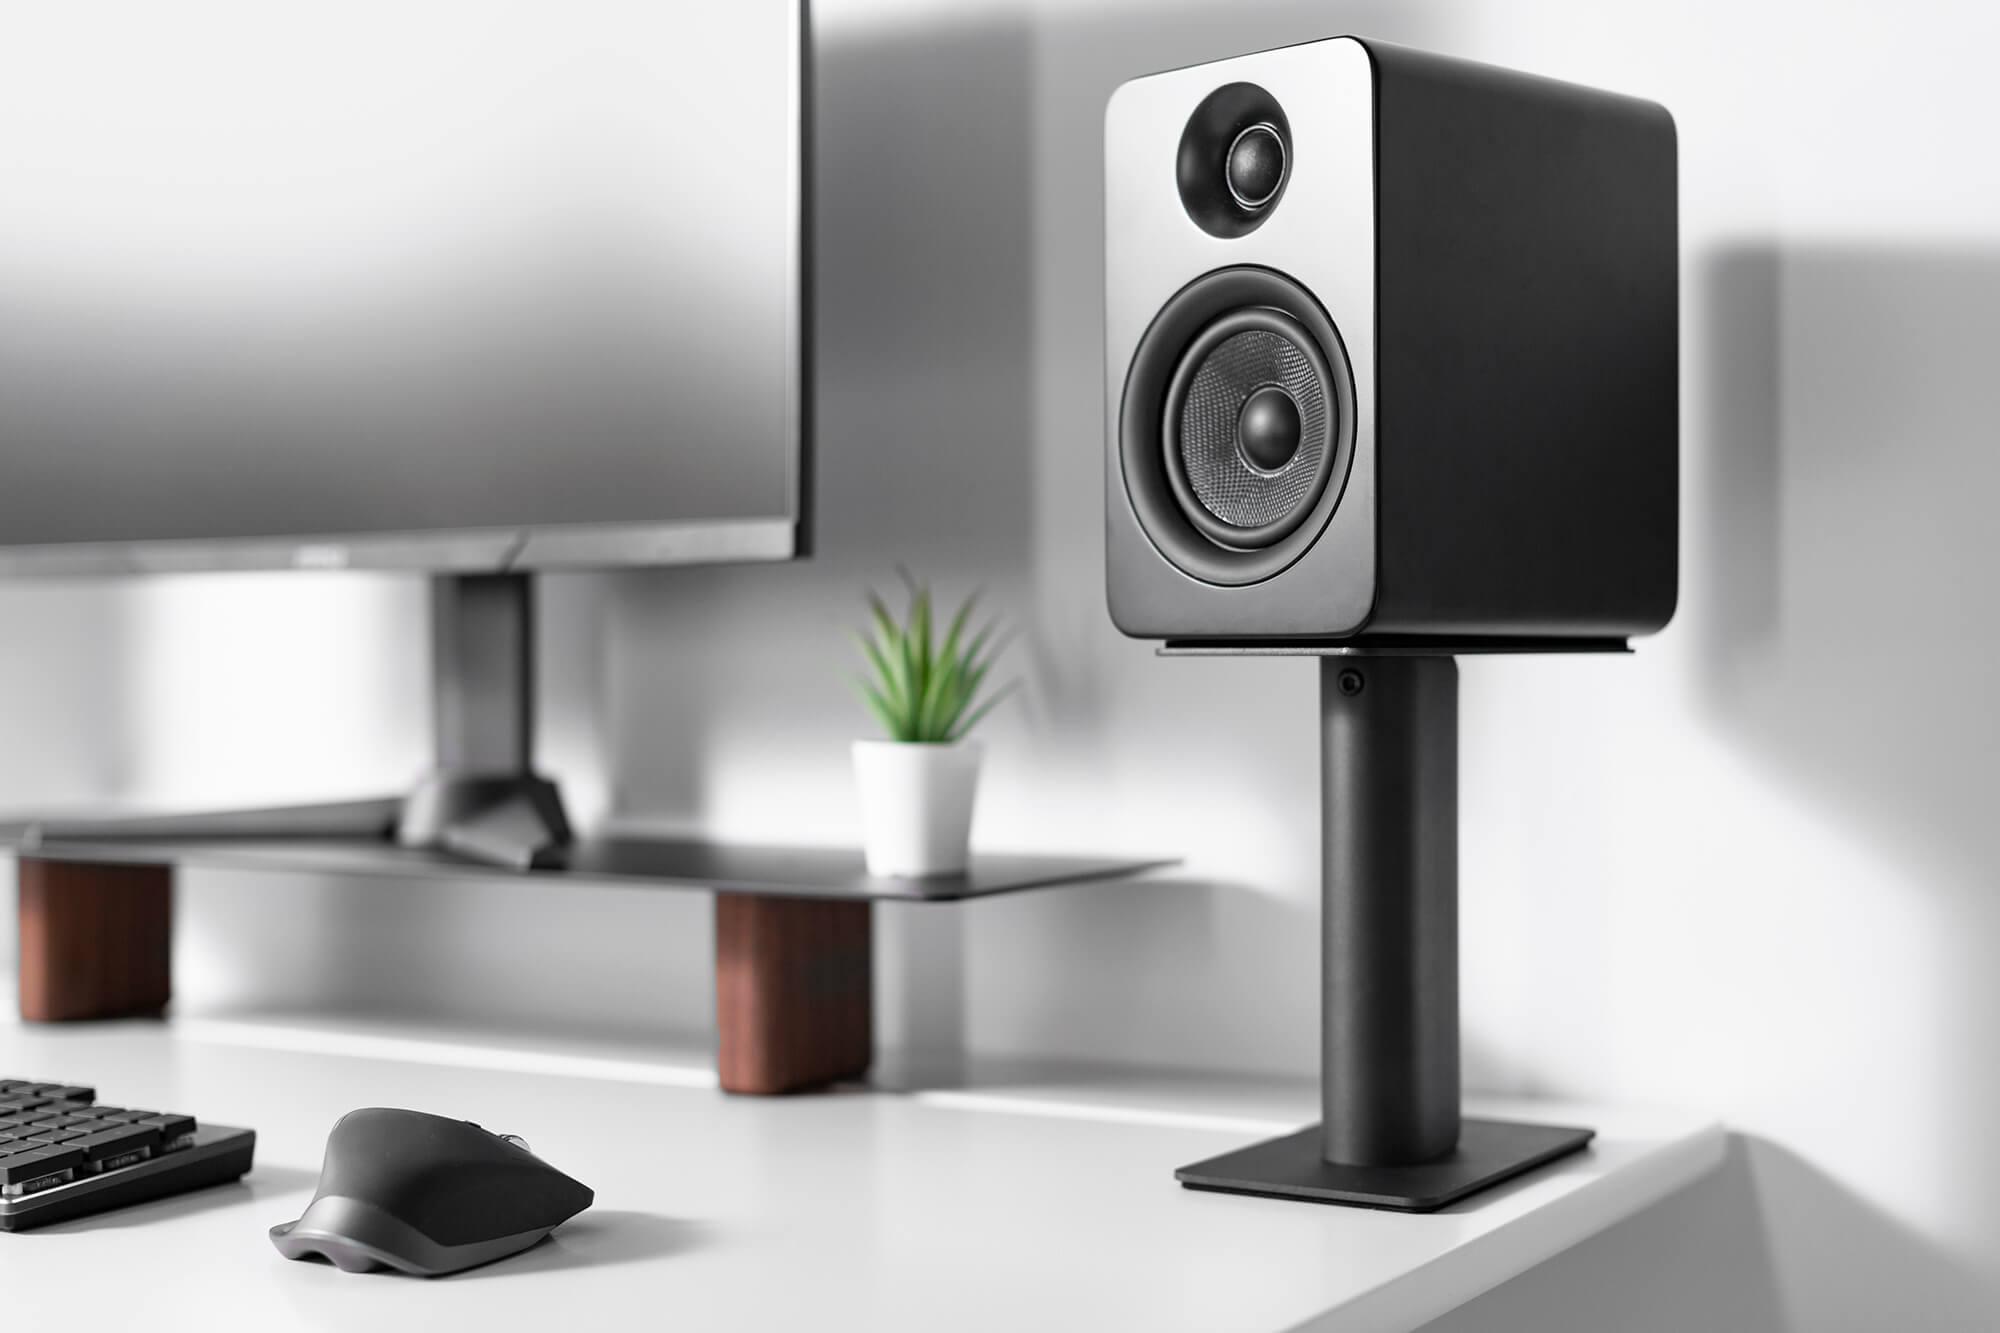 sp9_speaker-stand_lifestyle-3